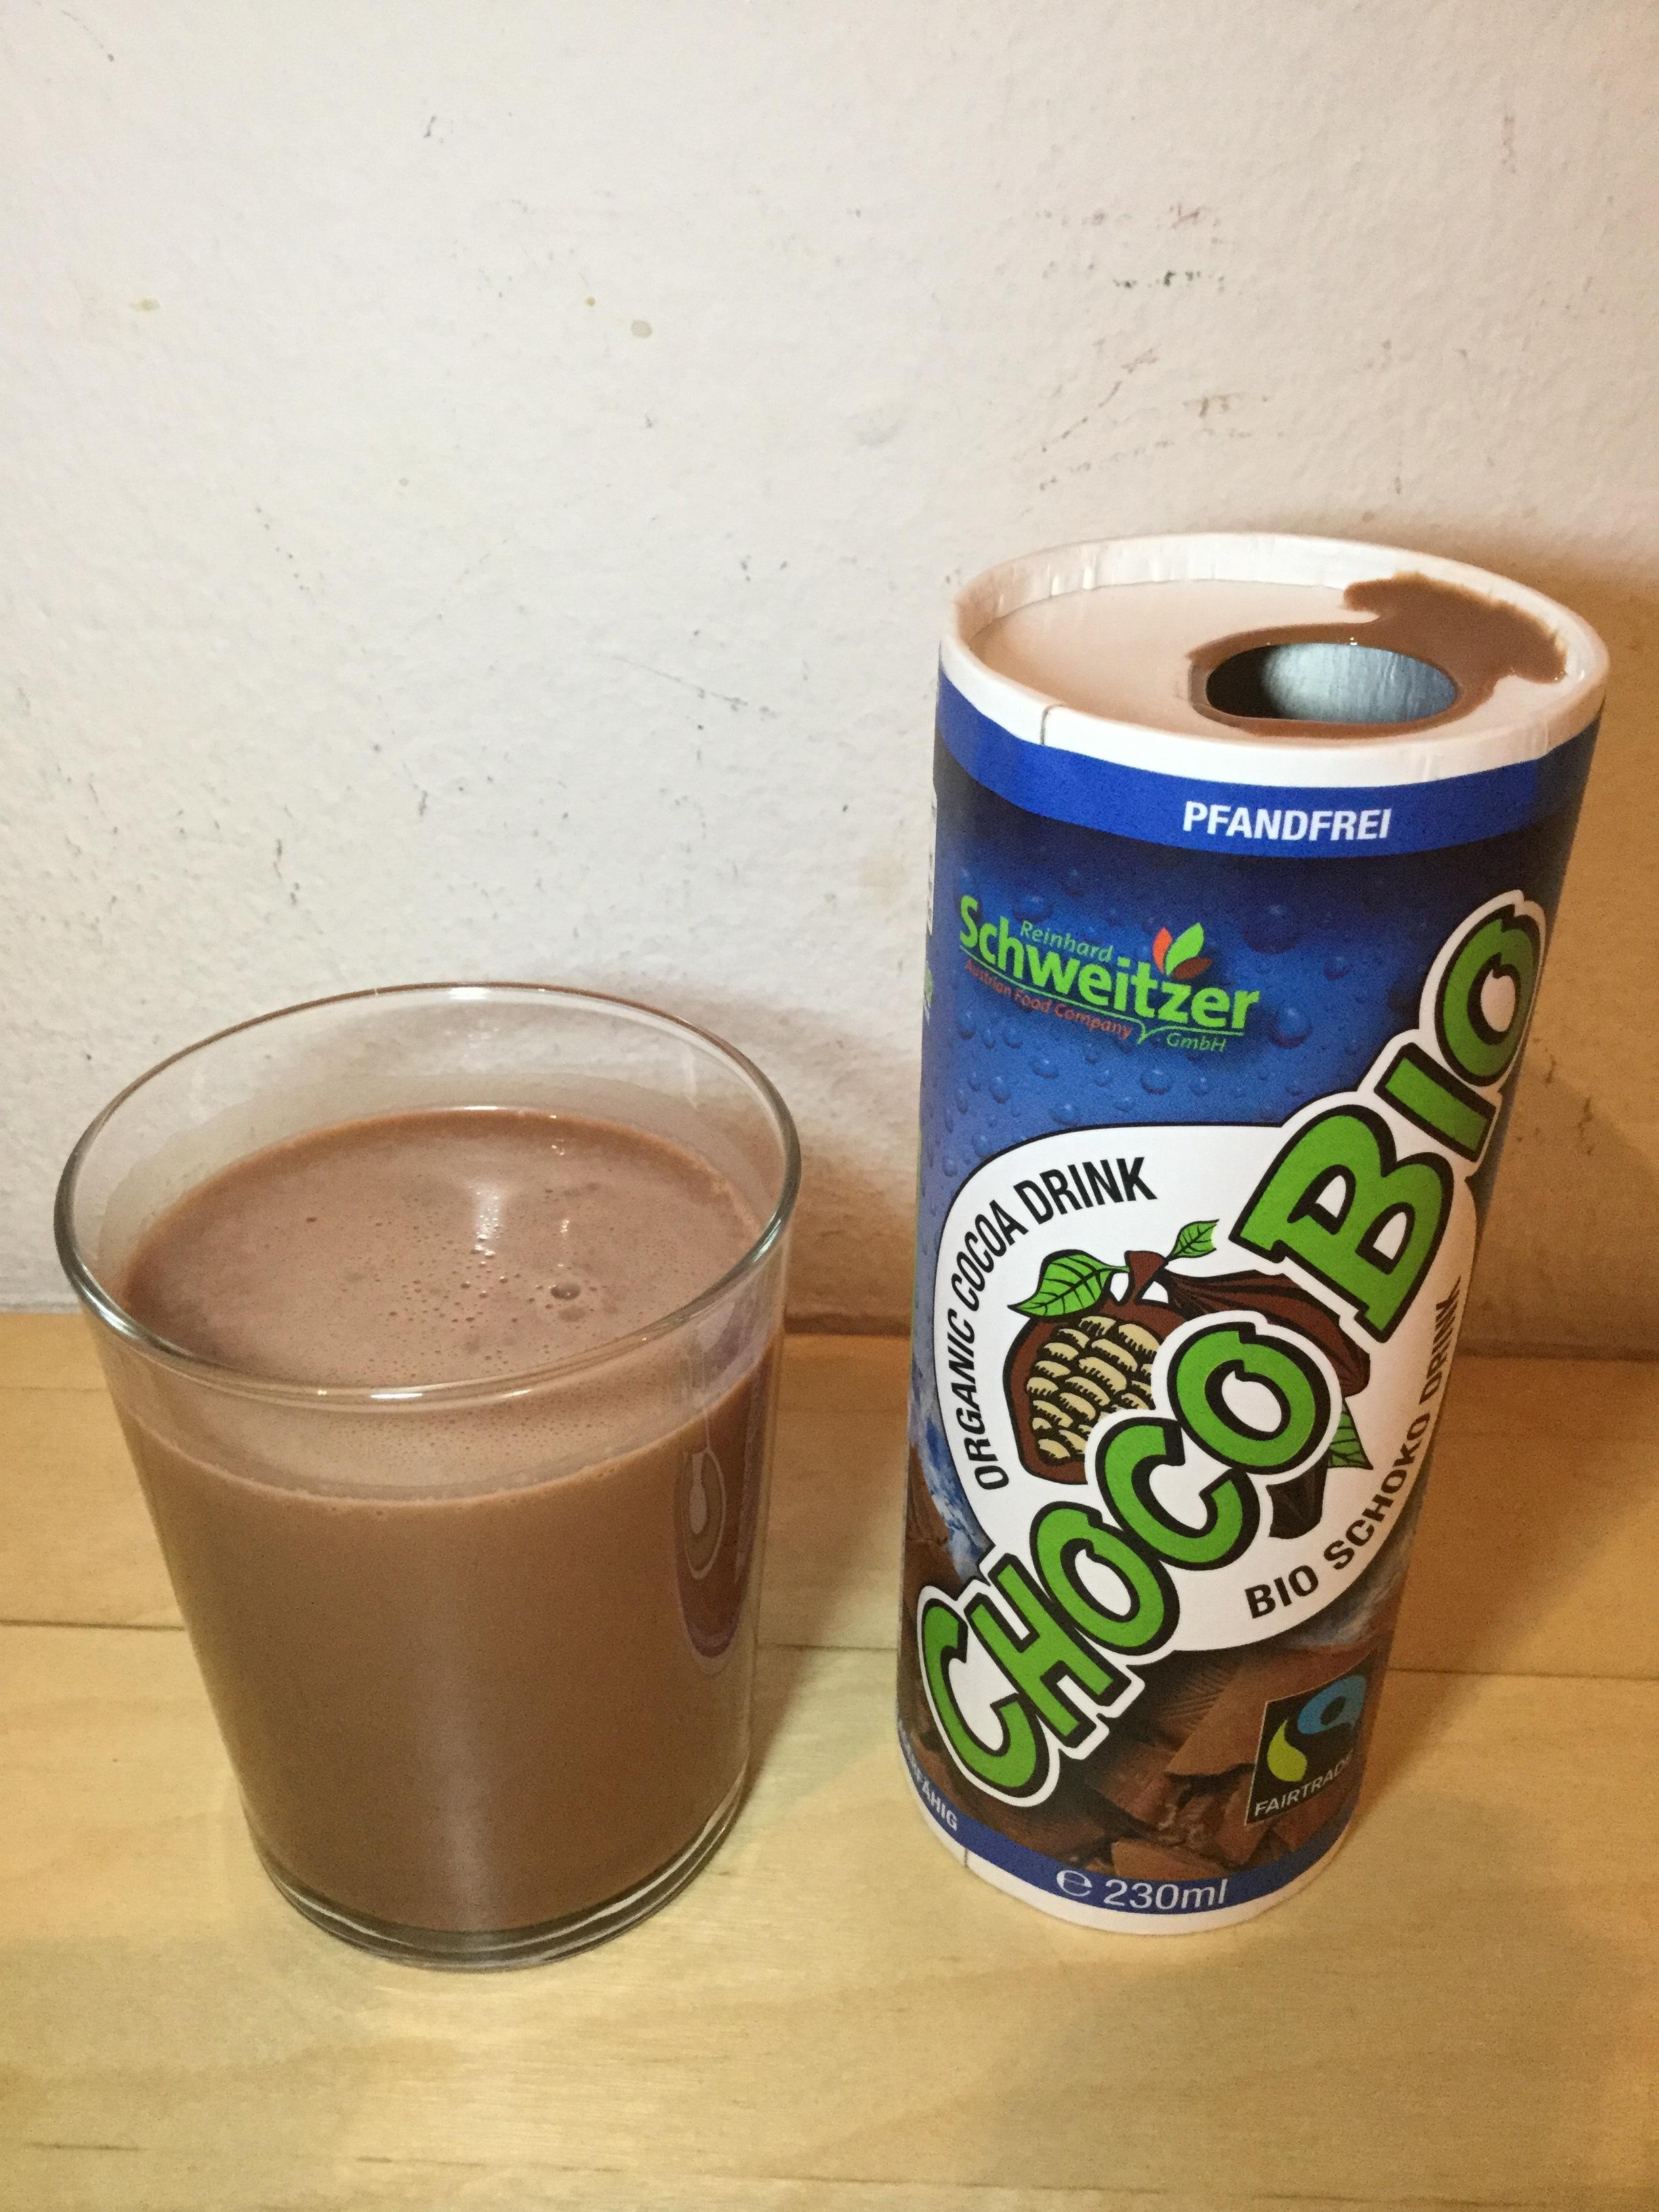 Schweitzer Choco Bio Organic Cocoa Drink Cup